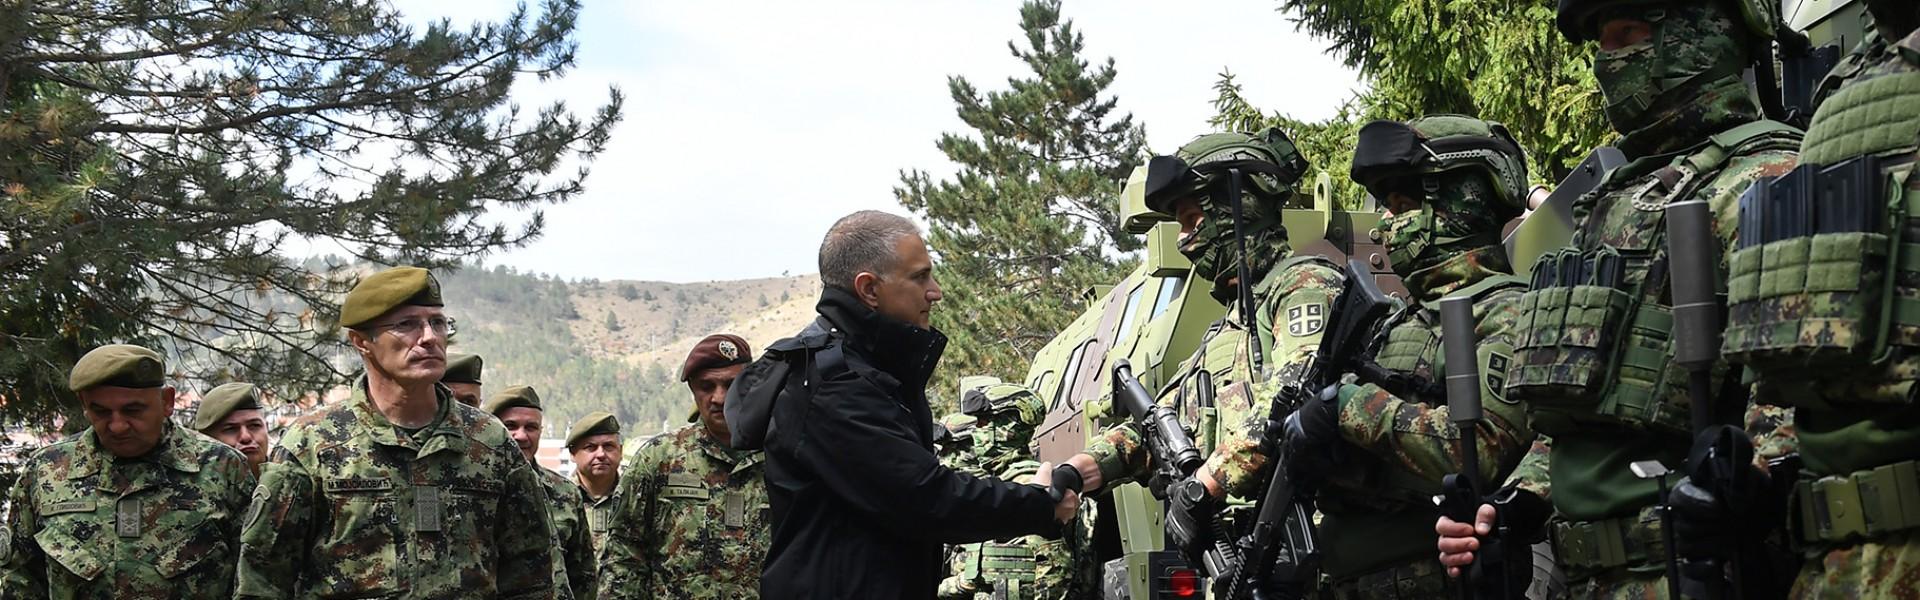 Minister of Defence Stefanović and Chief of General Staff, General Mojsilović, visit units on alert